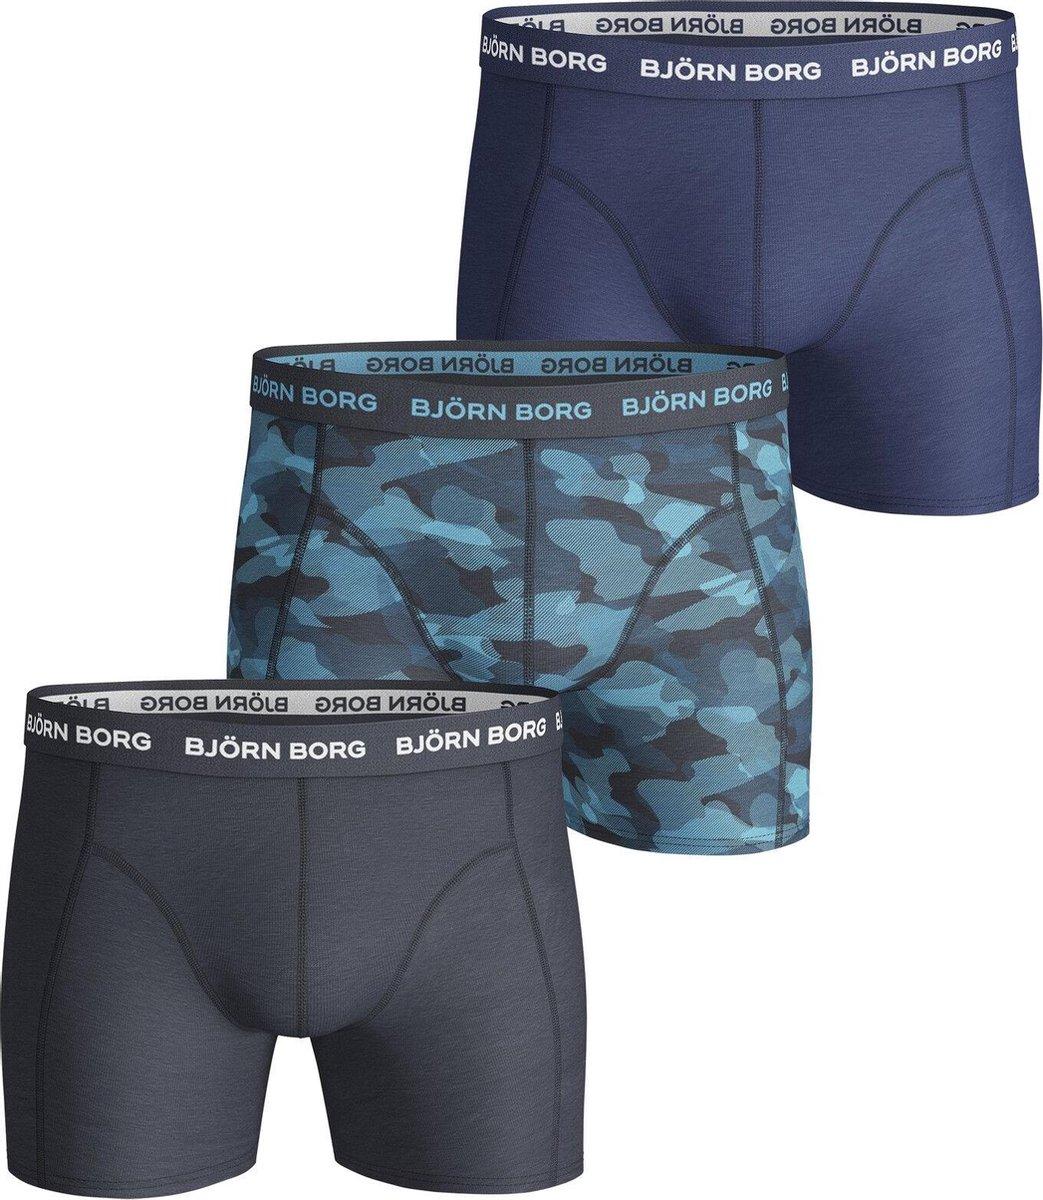 Bjorn Borg Heren Boxershorts - 3-pack - Zwart/Blauw - Maat L